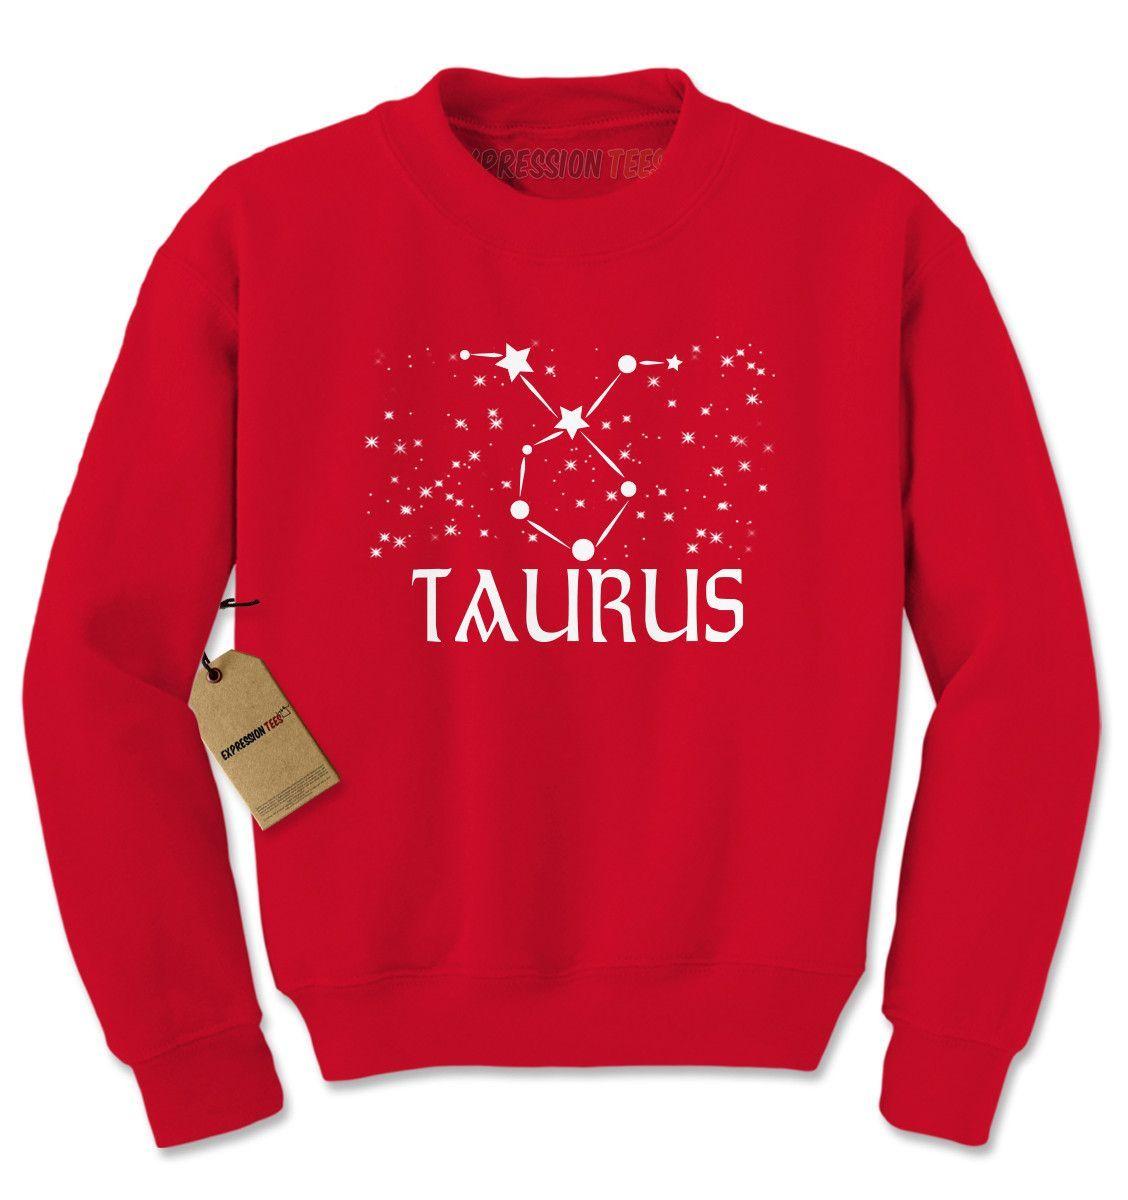 Taurus Zodiac Star Chart Adult Crewneck Sweatshirt